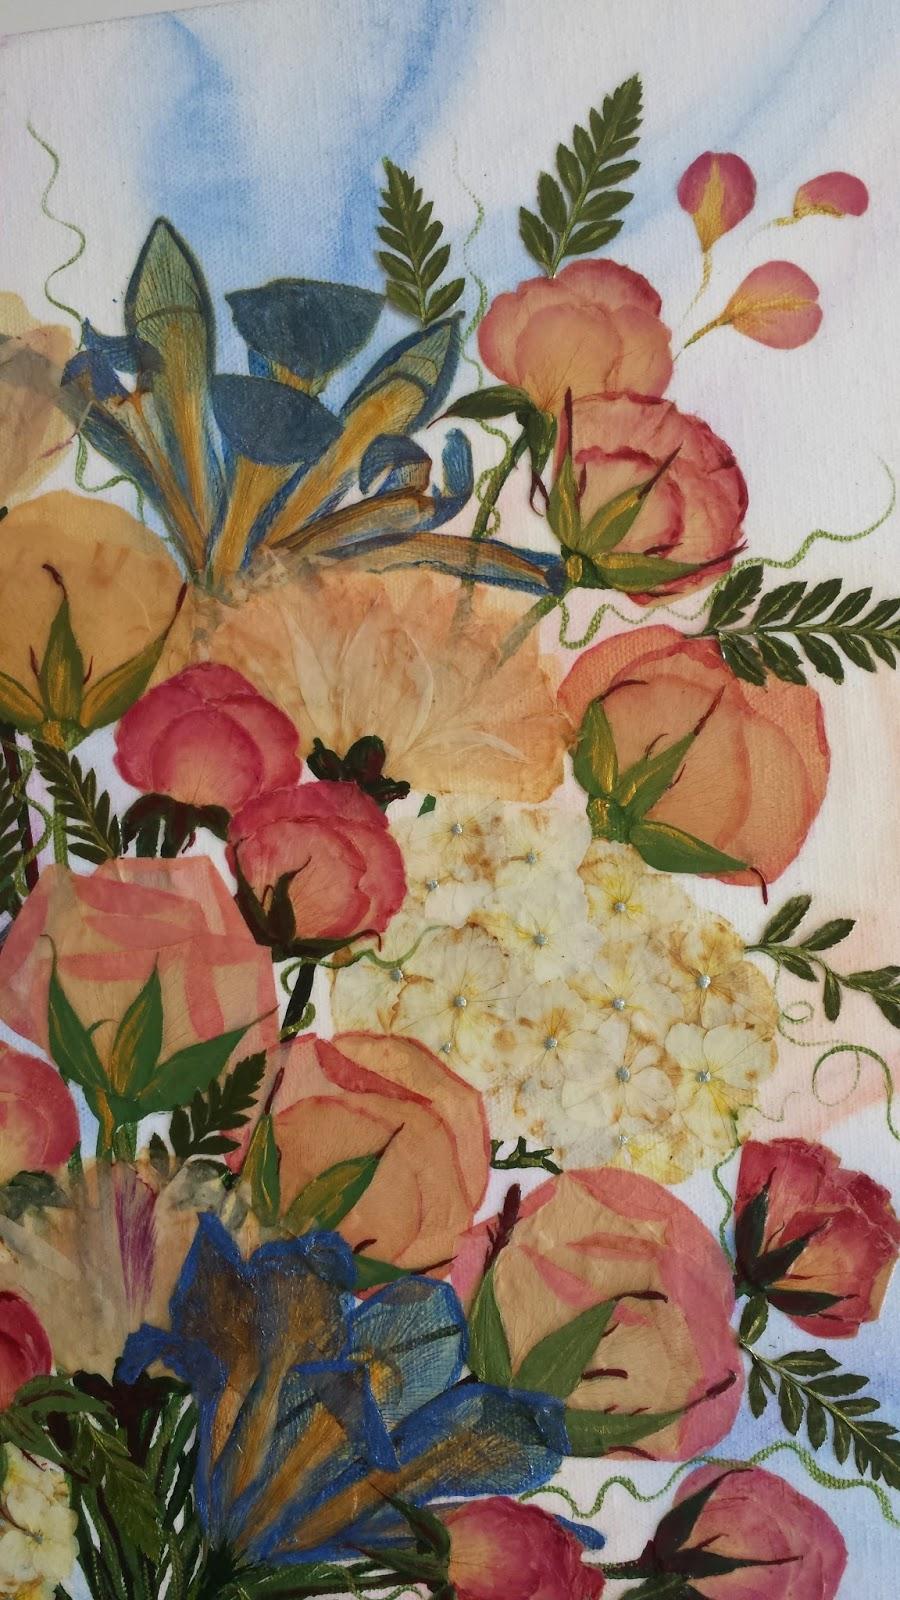 Curlyart wedding flower preservation on canvas amys wedding flower painting izmirmasajfo